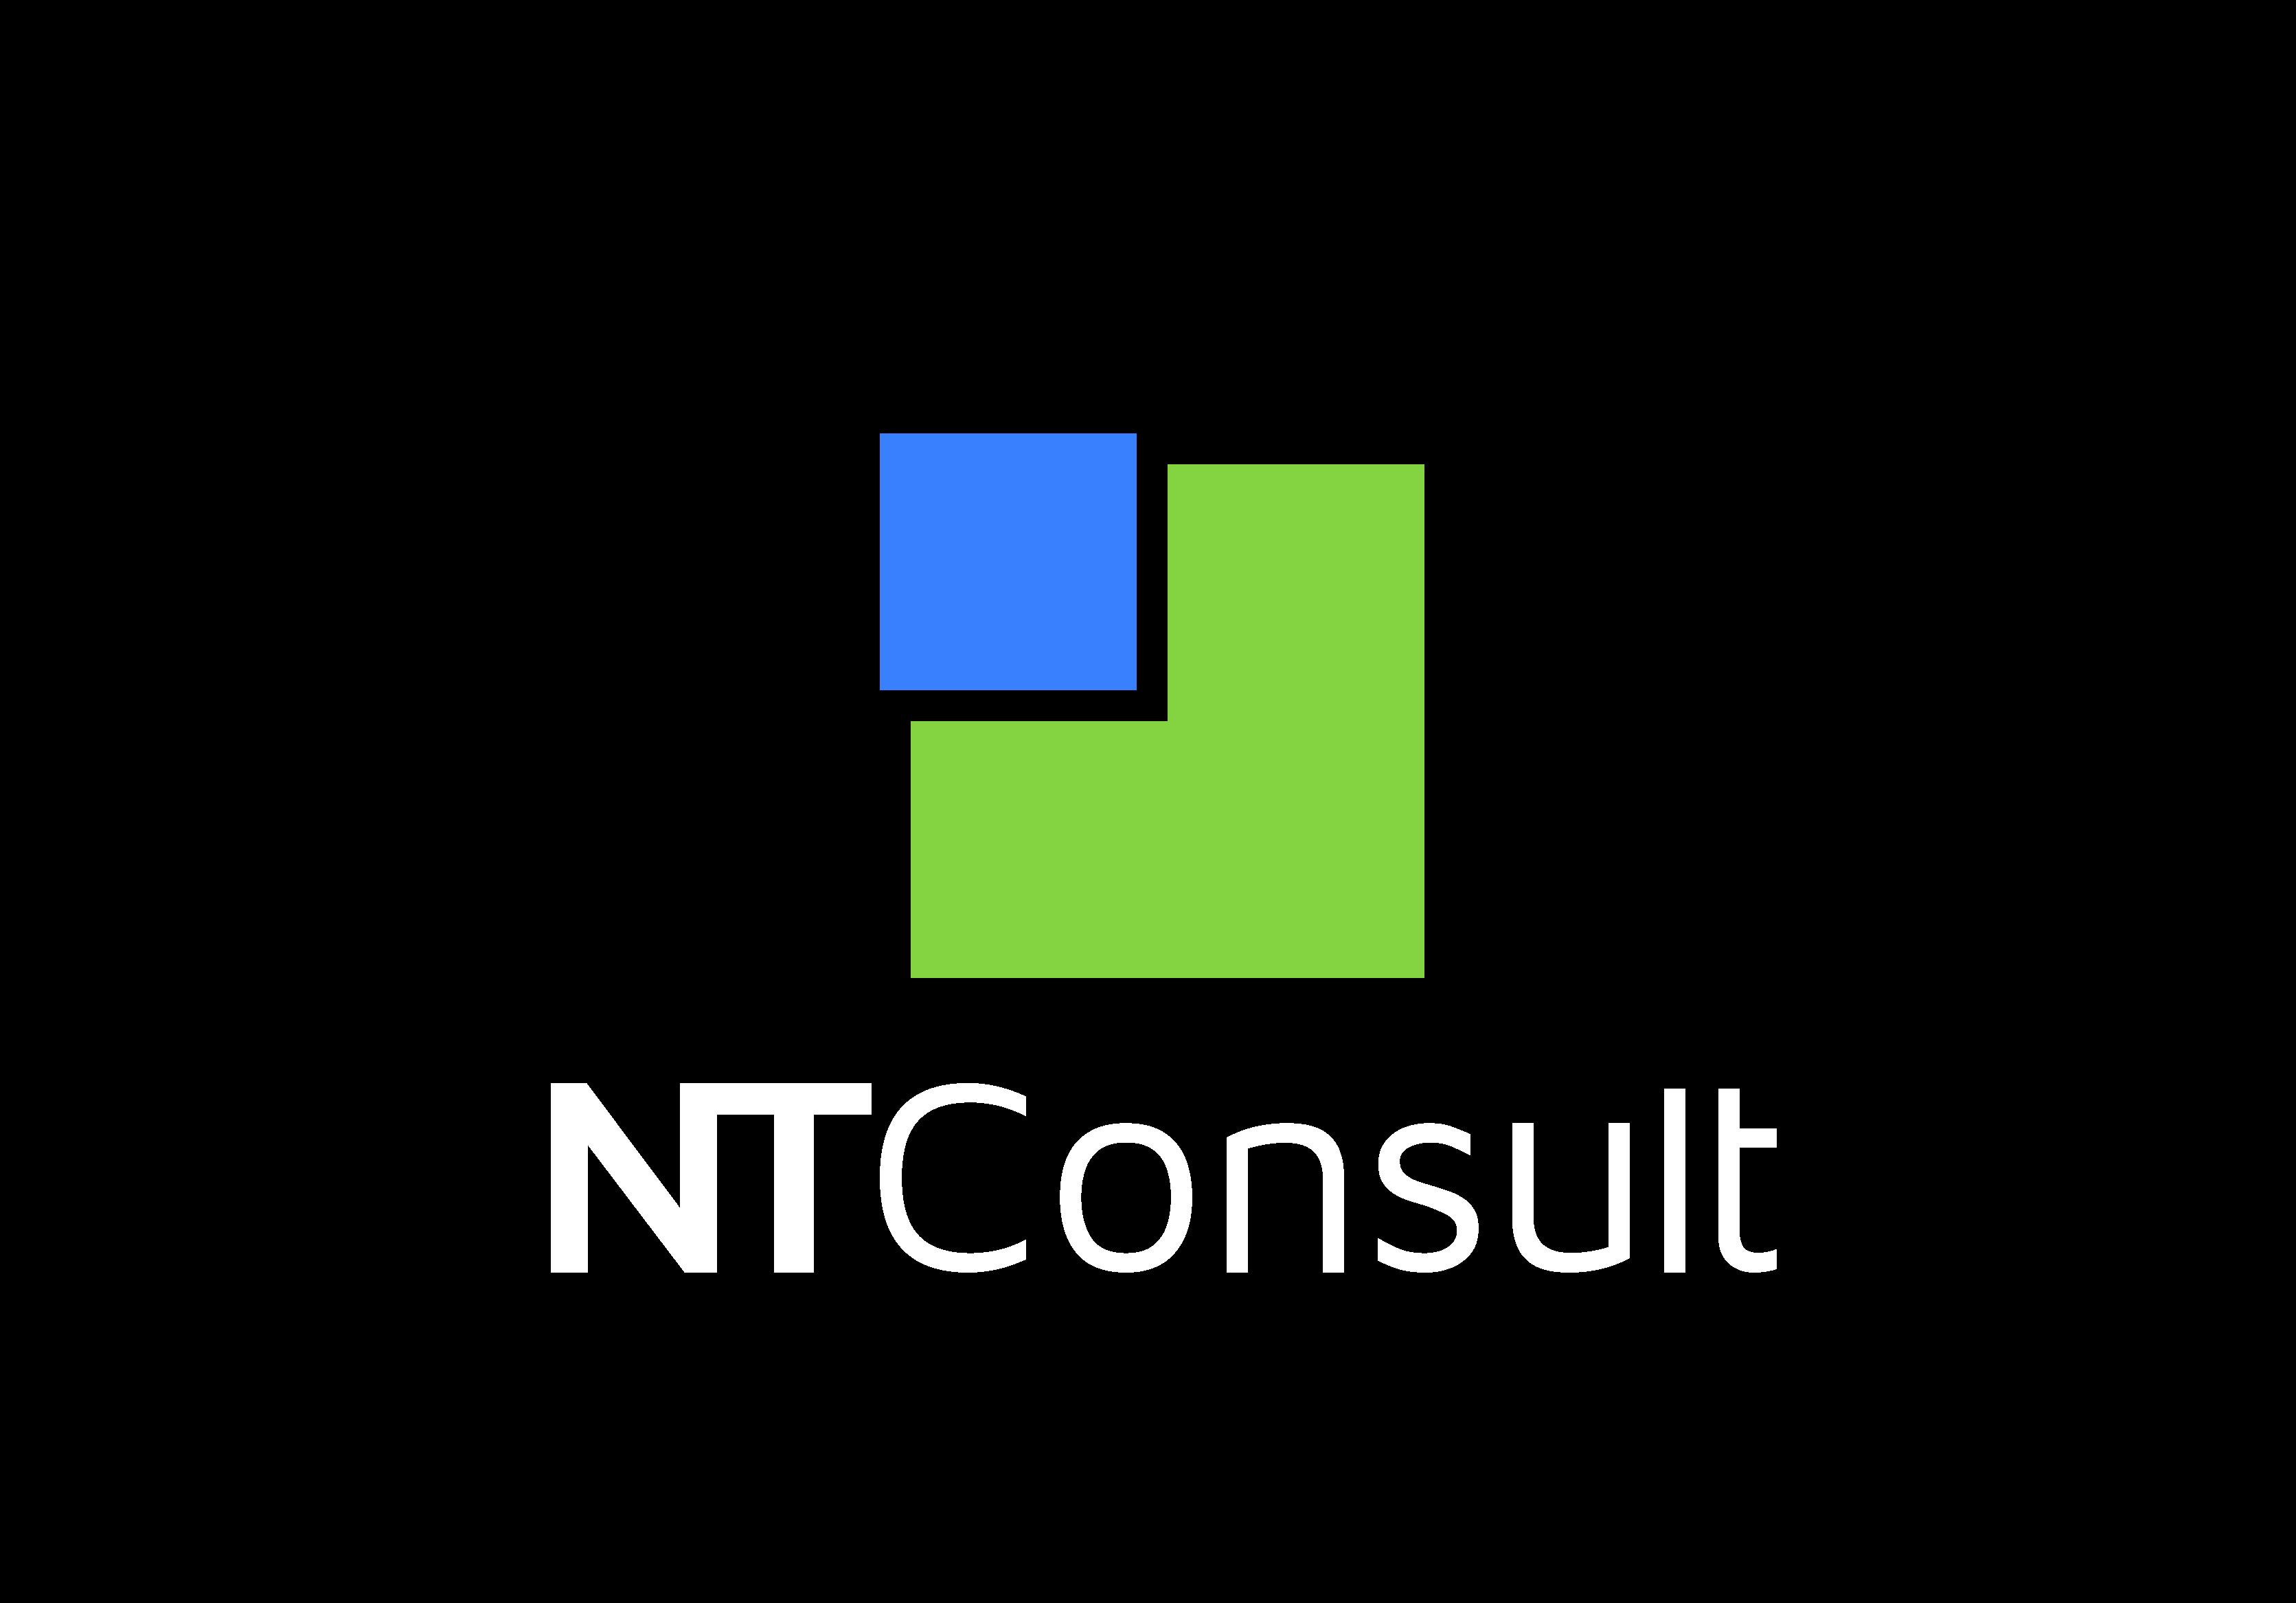 NTConsult